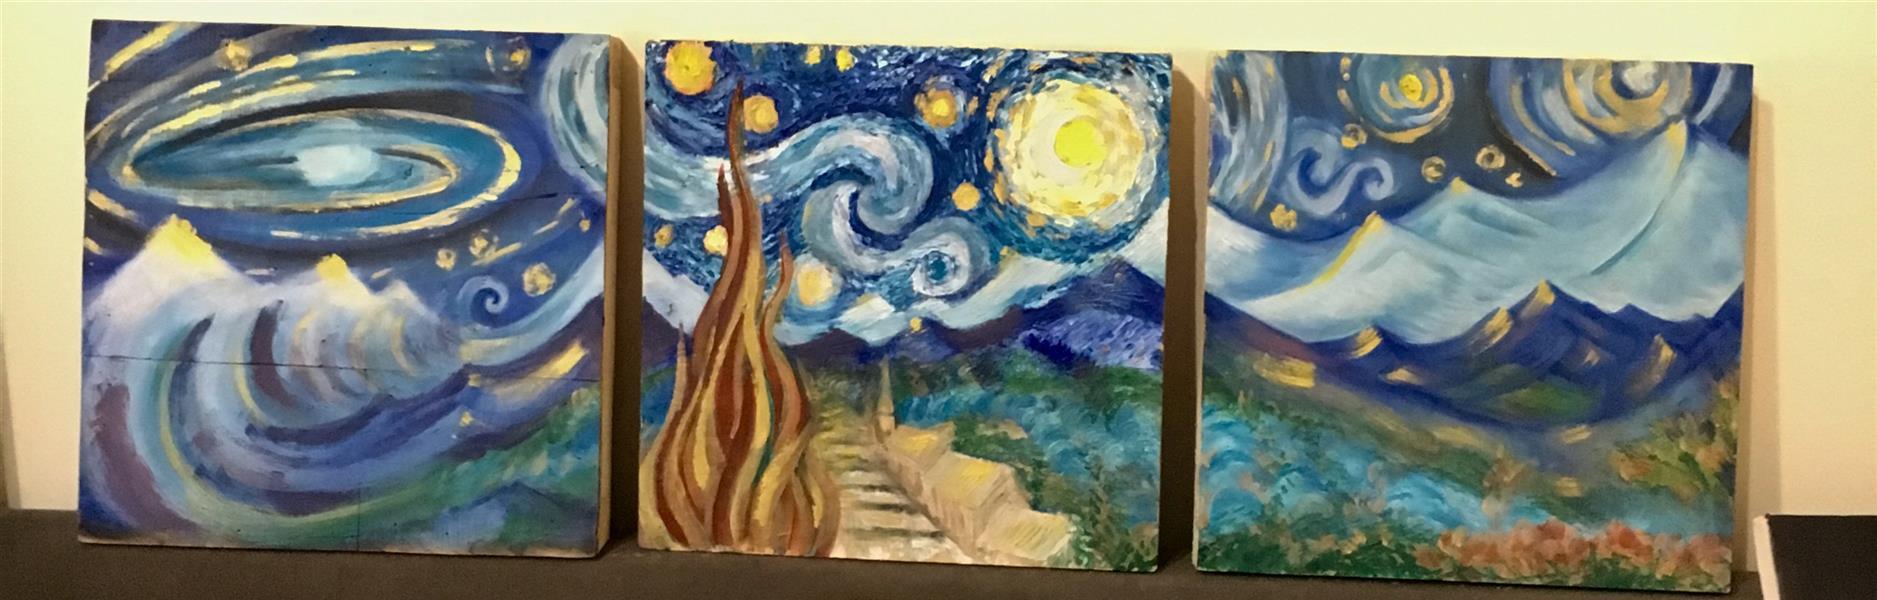 هنر نقاشی و گرافیک محفل نقاشی و گرافیک Sara Azimi  # Van Gogh # paint # painting #art